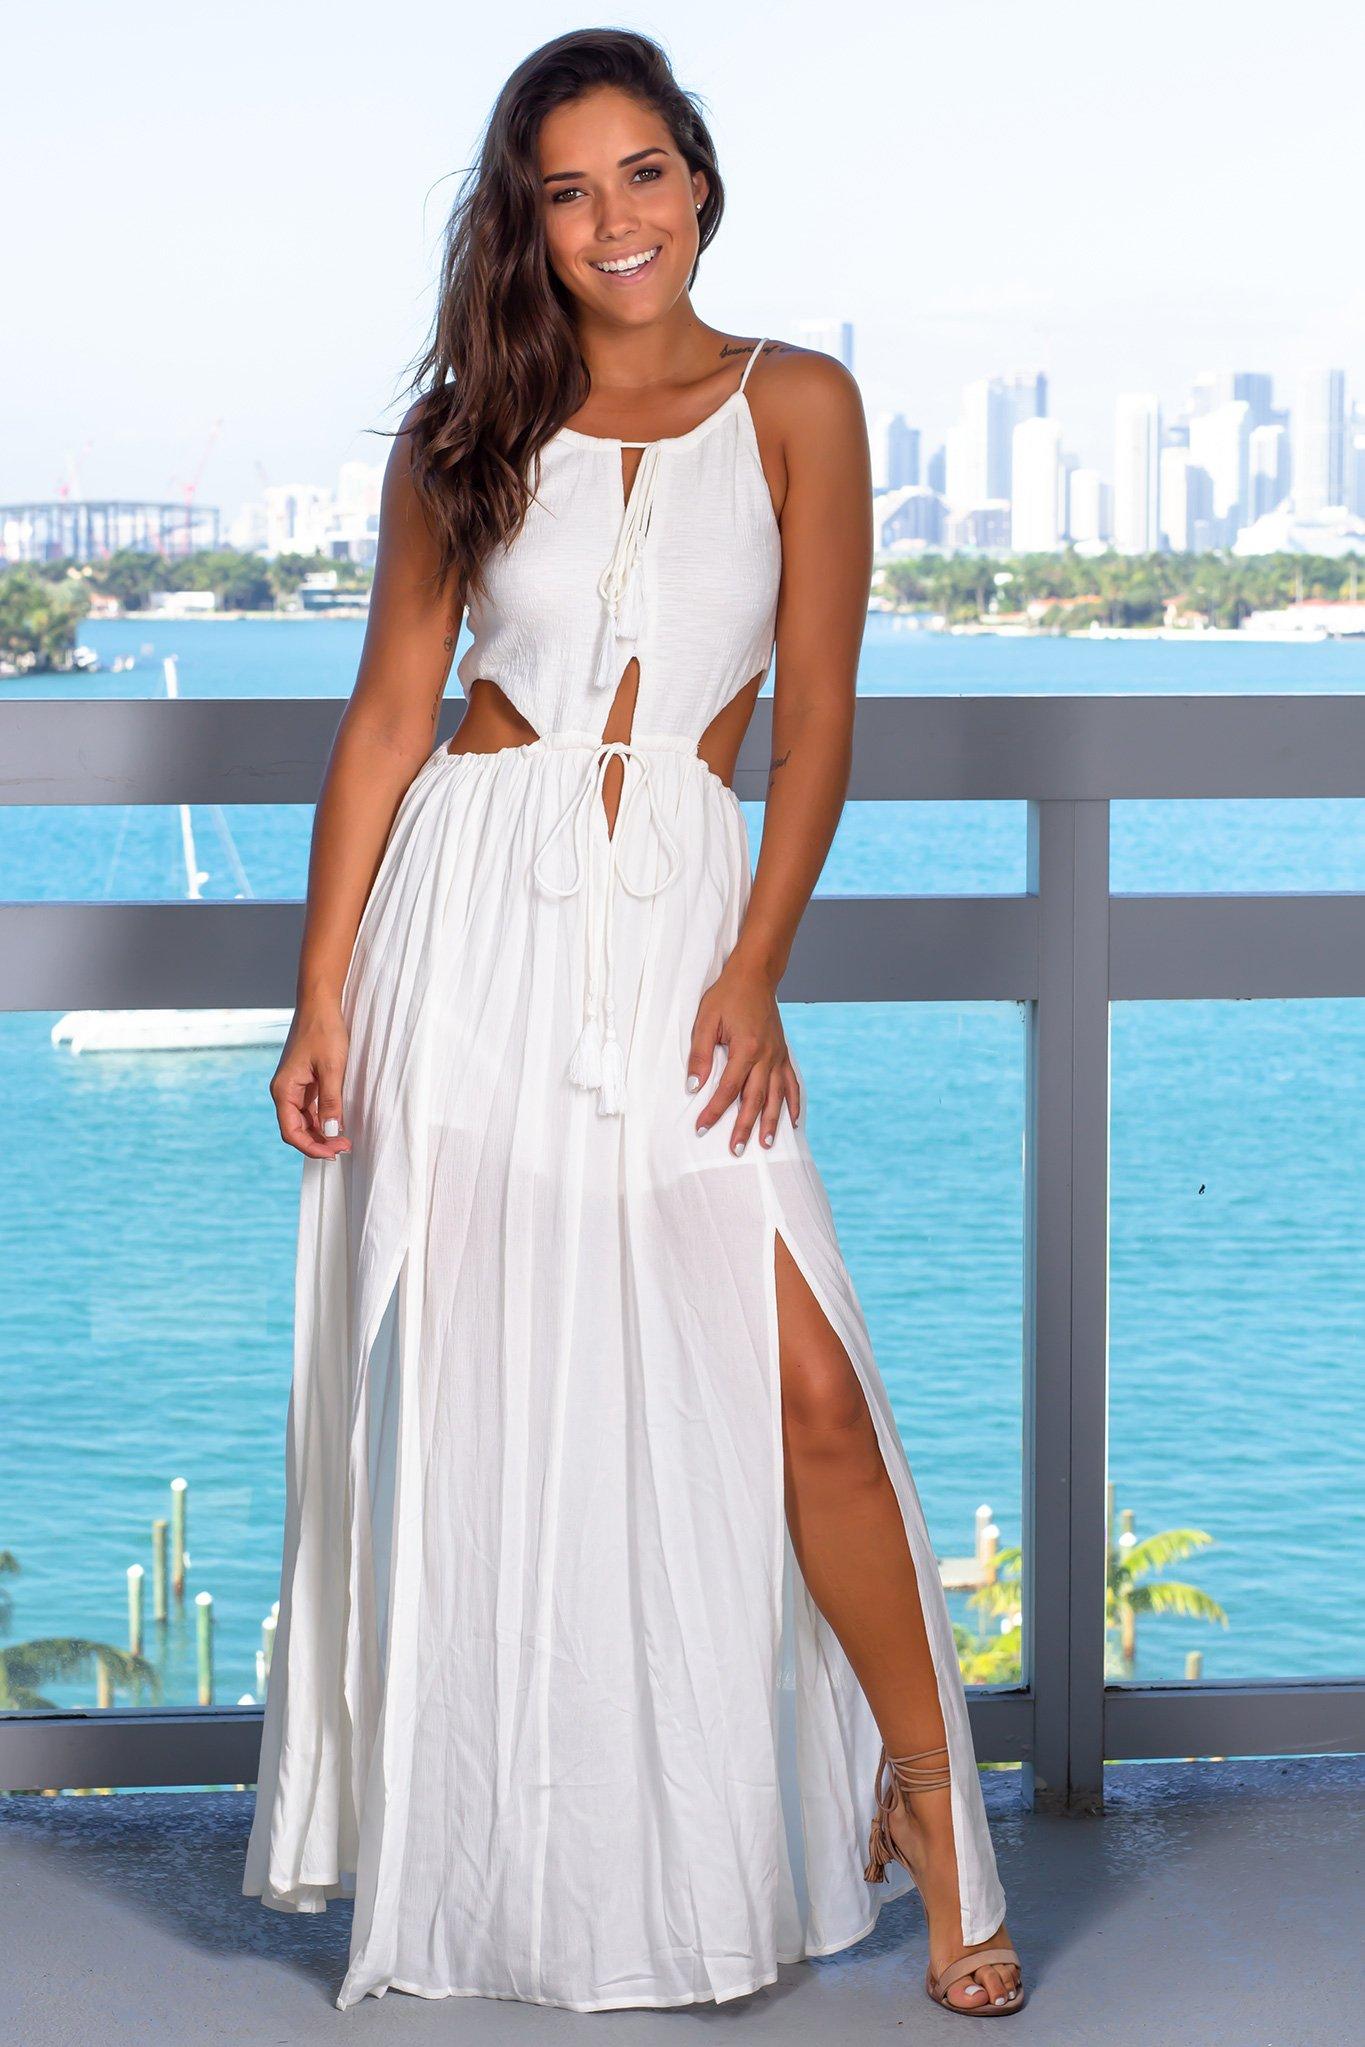 Ivory Maxi Dress With Waist Cutouts Ivory Maxi Dress Maxi Dress Cutout Maxi Dress [ 2047 x 1365 Pixel ]